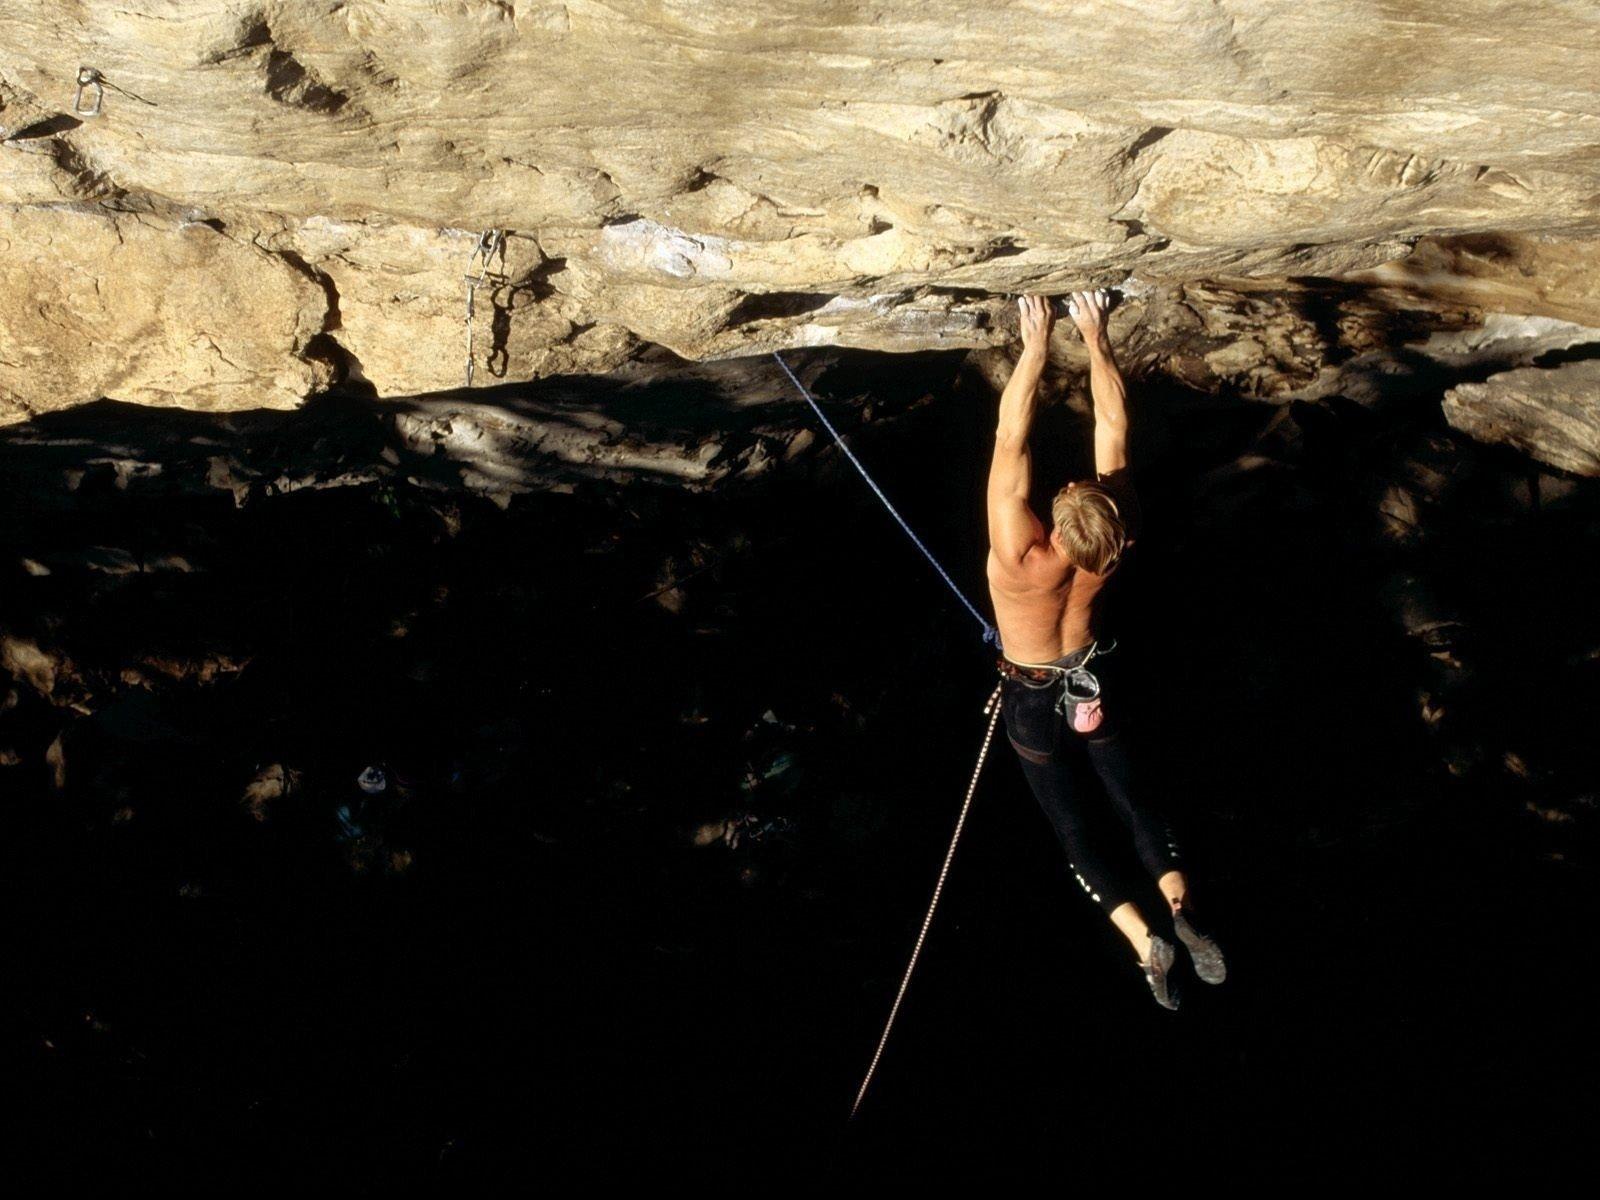 Sports - Climbing  People Extreme Danger Wallpaper